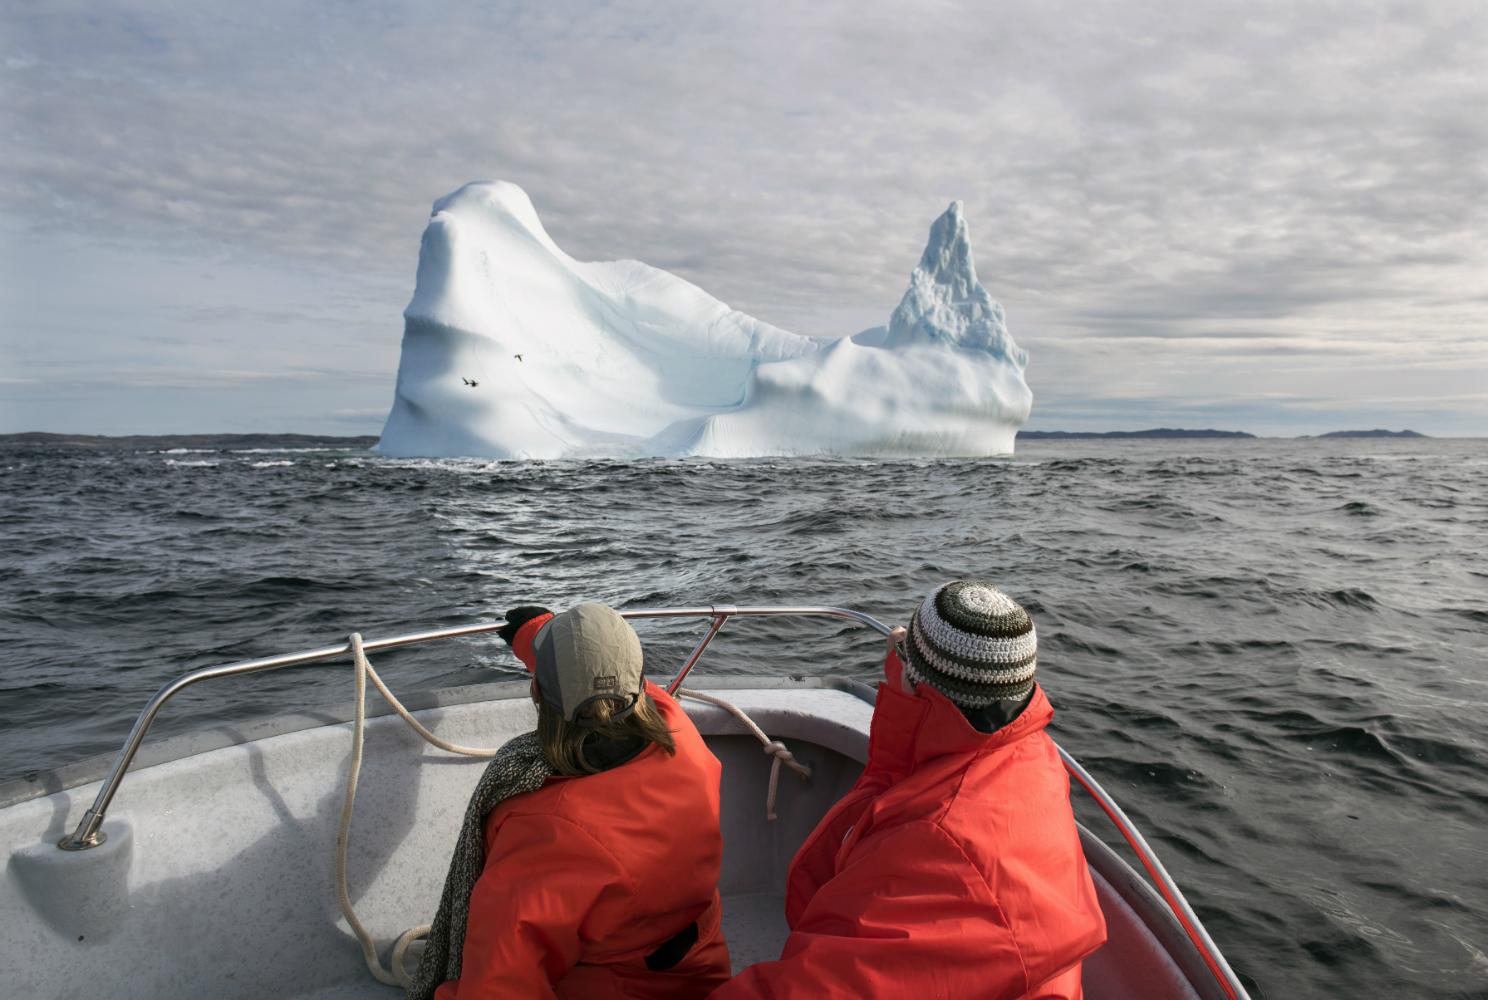 Fogo_Island_Iceberg_0975_original-w1500-h1000